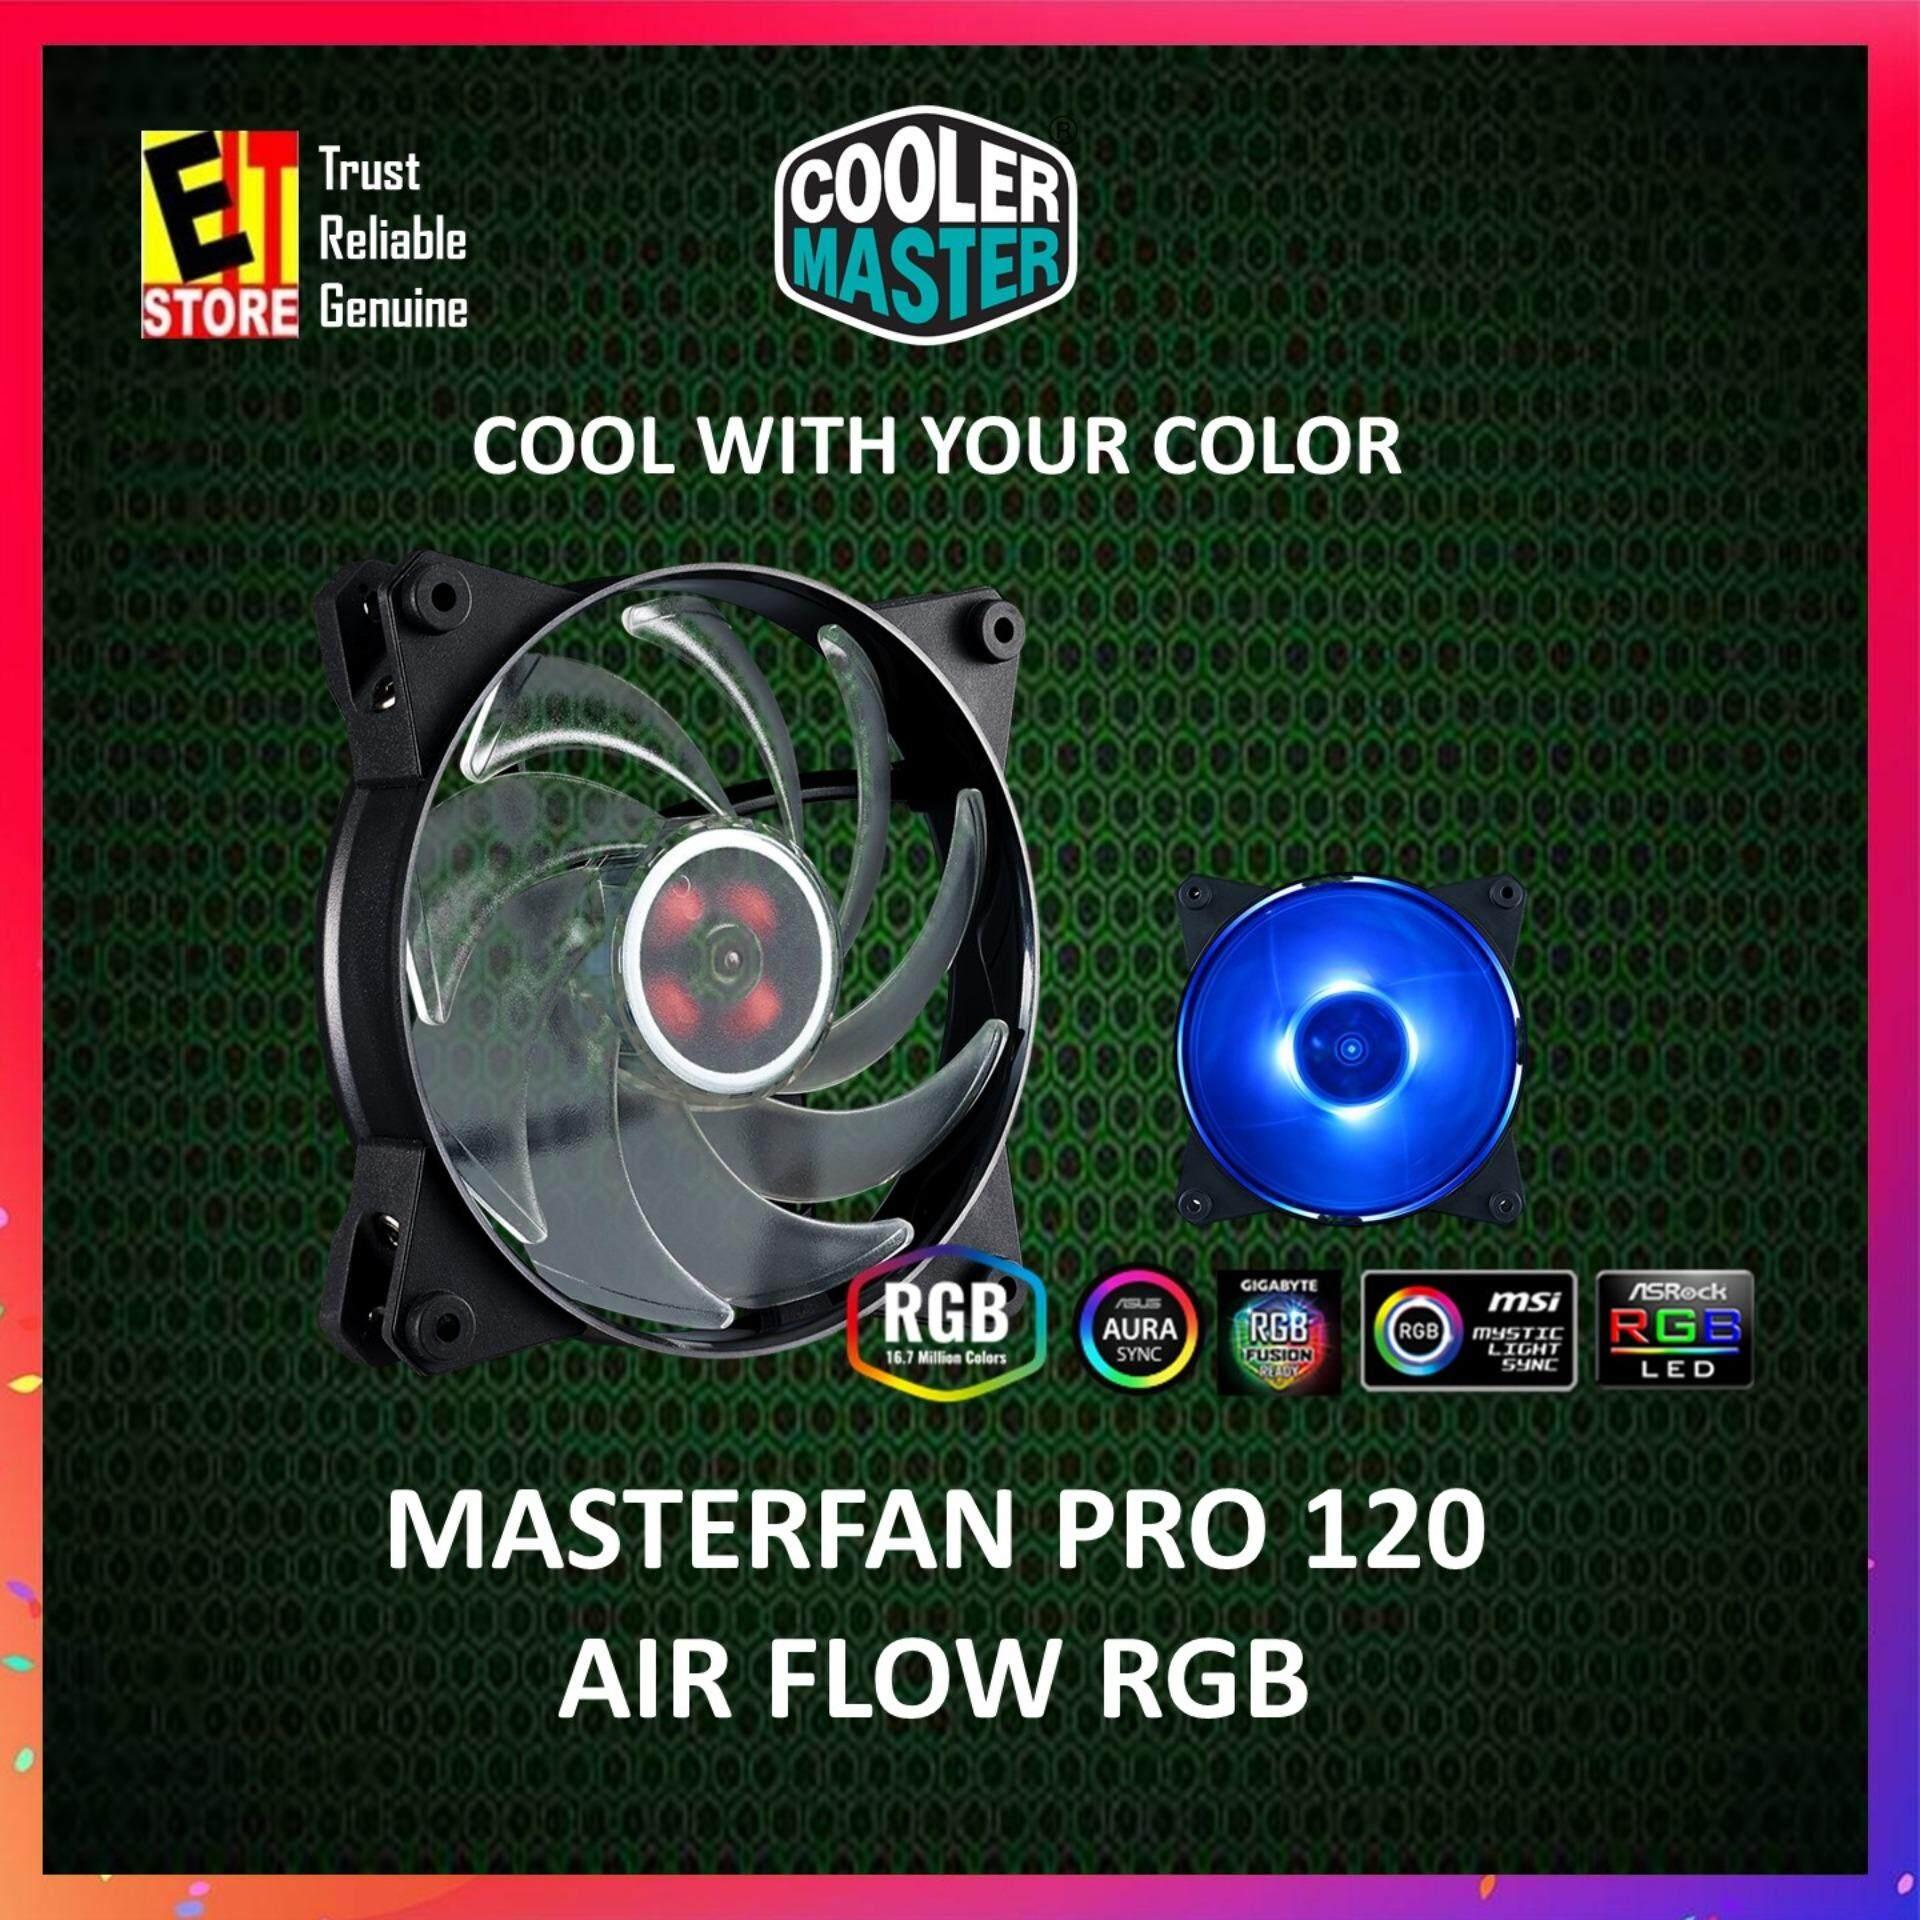 COOLER MASTER MASTERFAN PRO 120 AIR FLOW RGB -MFY-F2DN-11NPC-F1